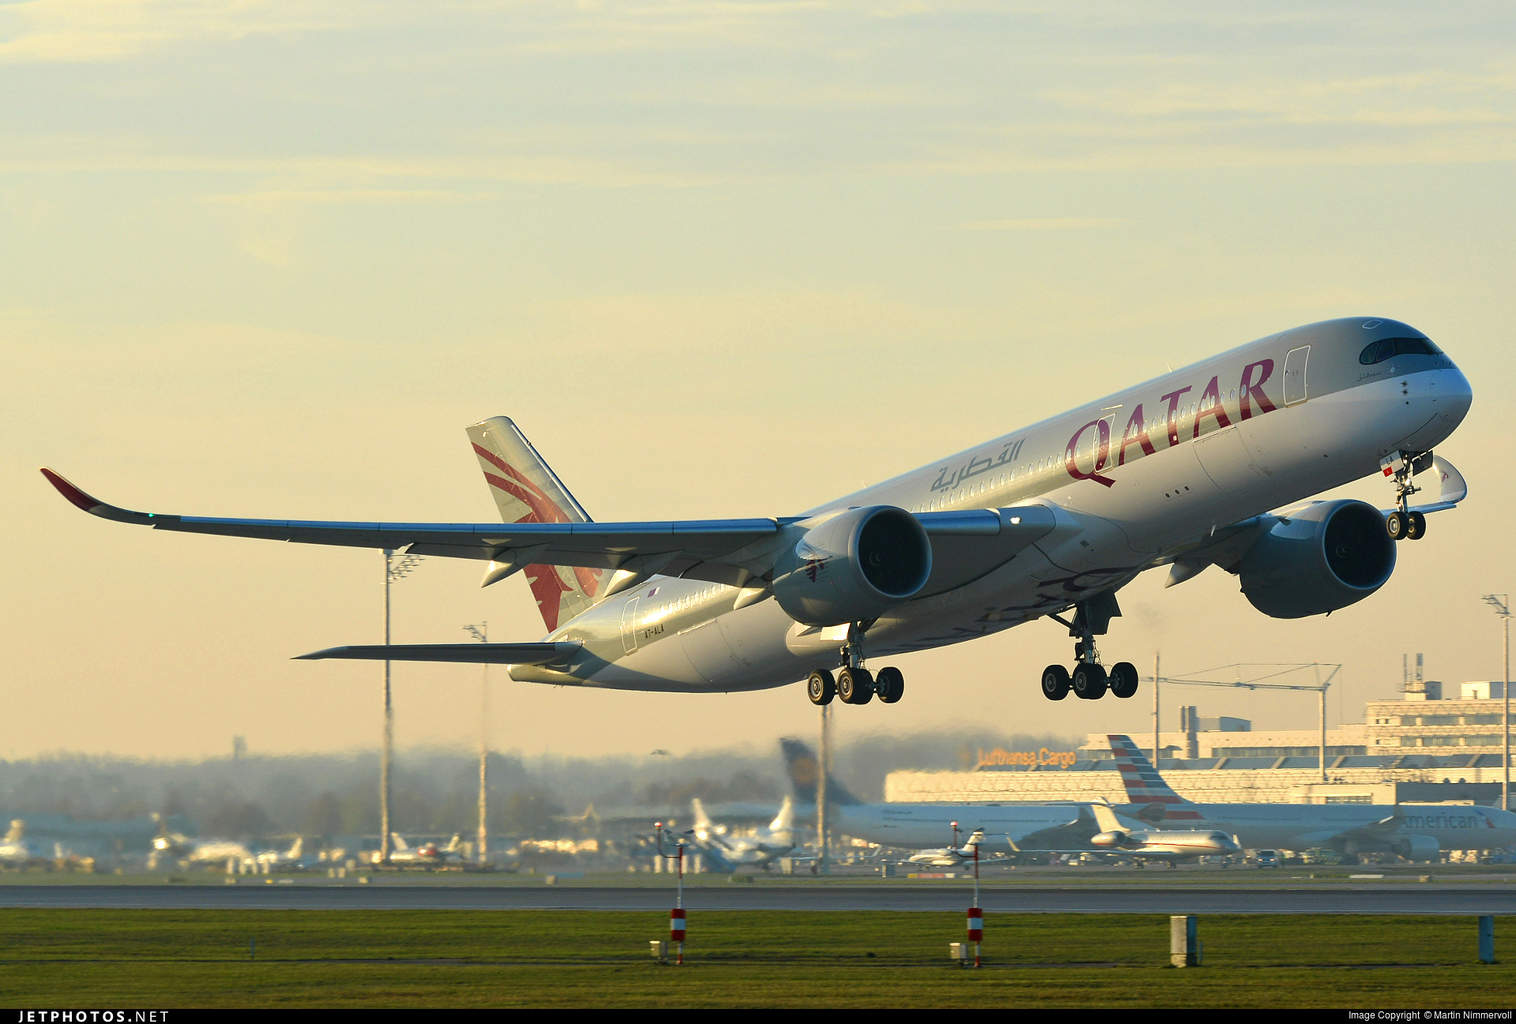 AWARE calls for boycott of Qatar Airways